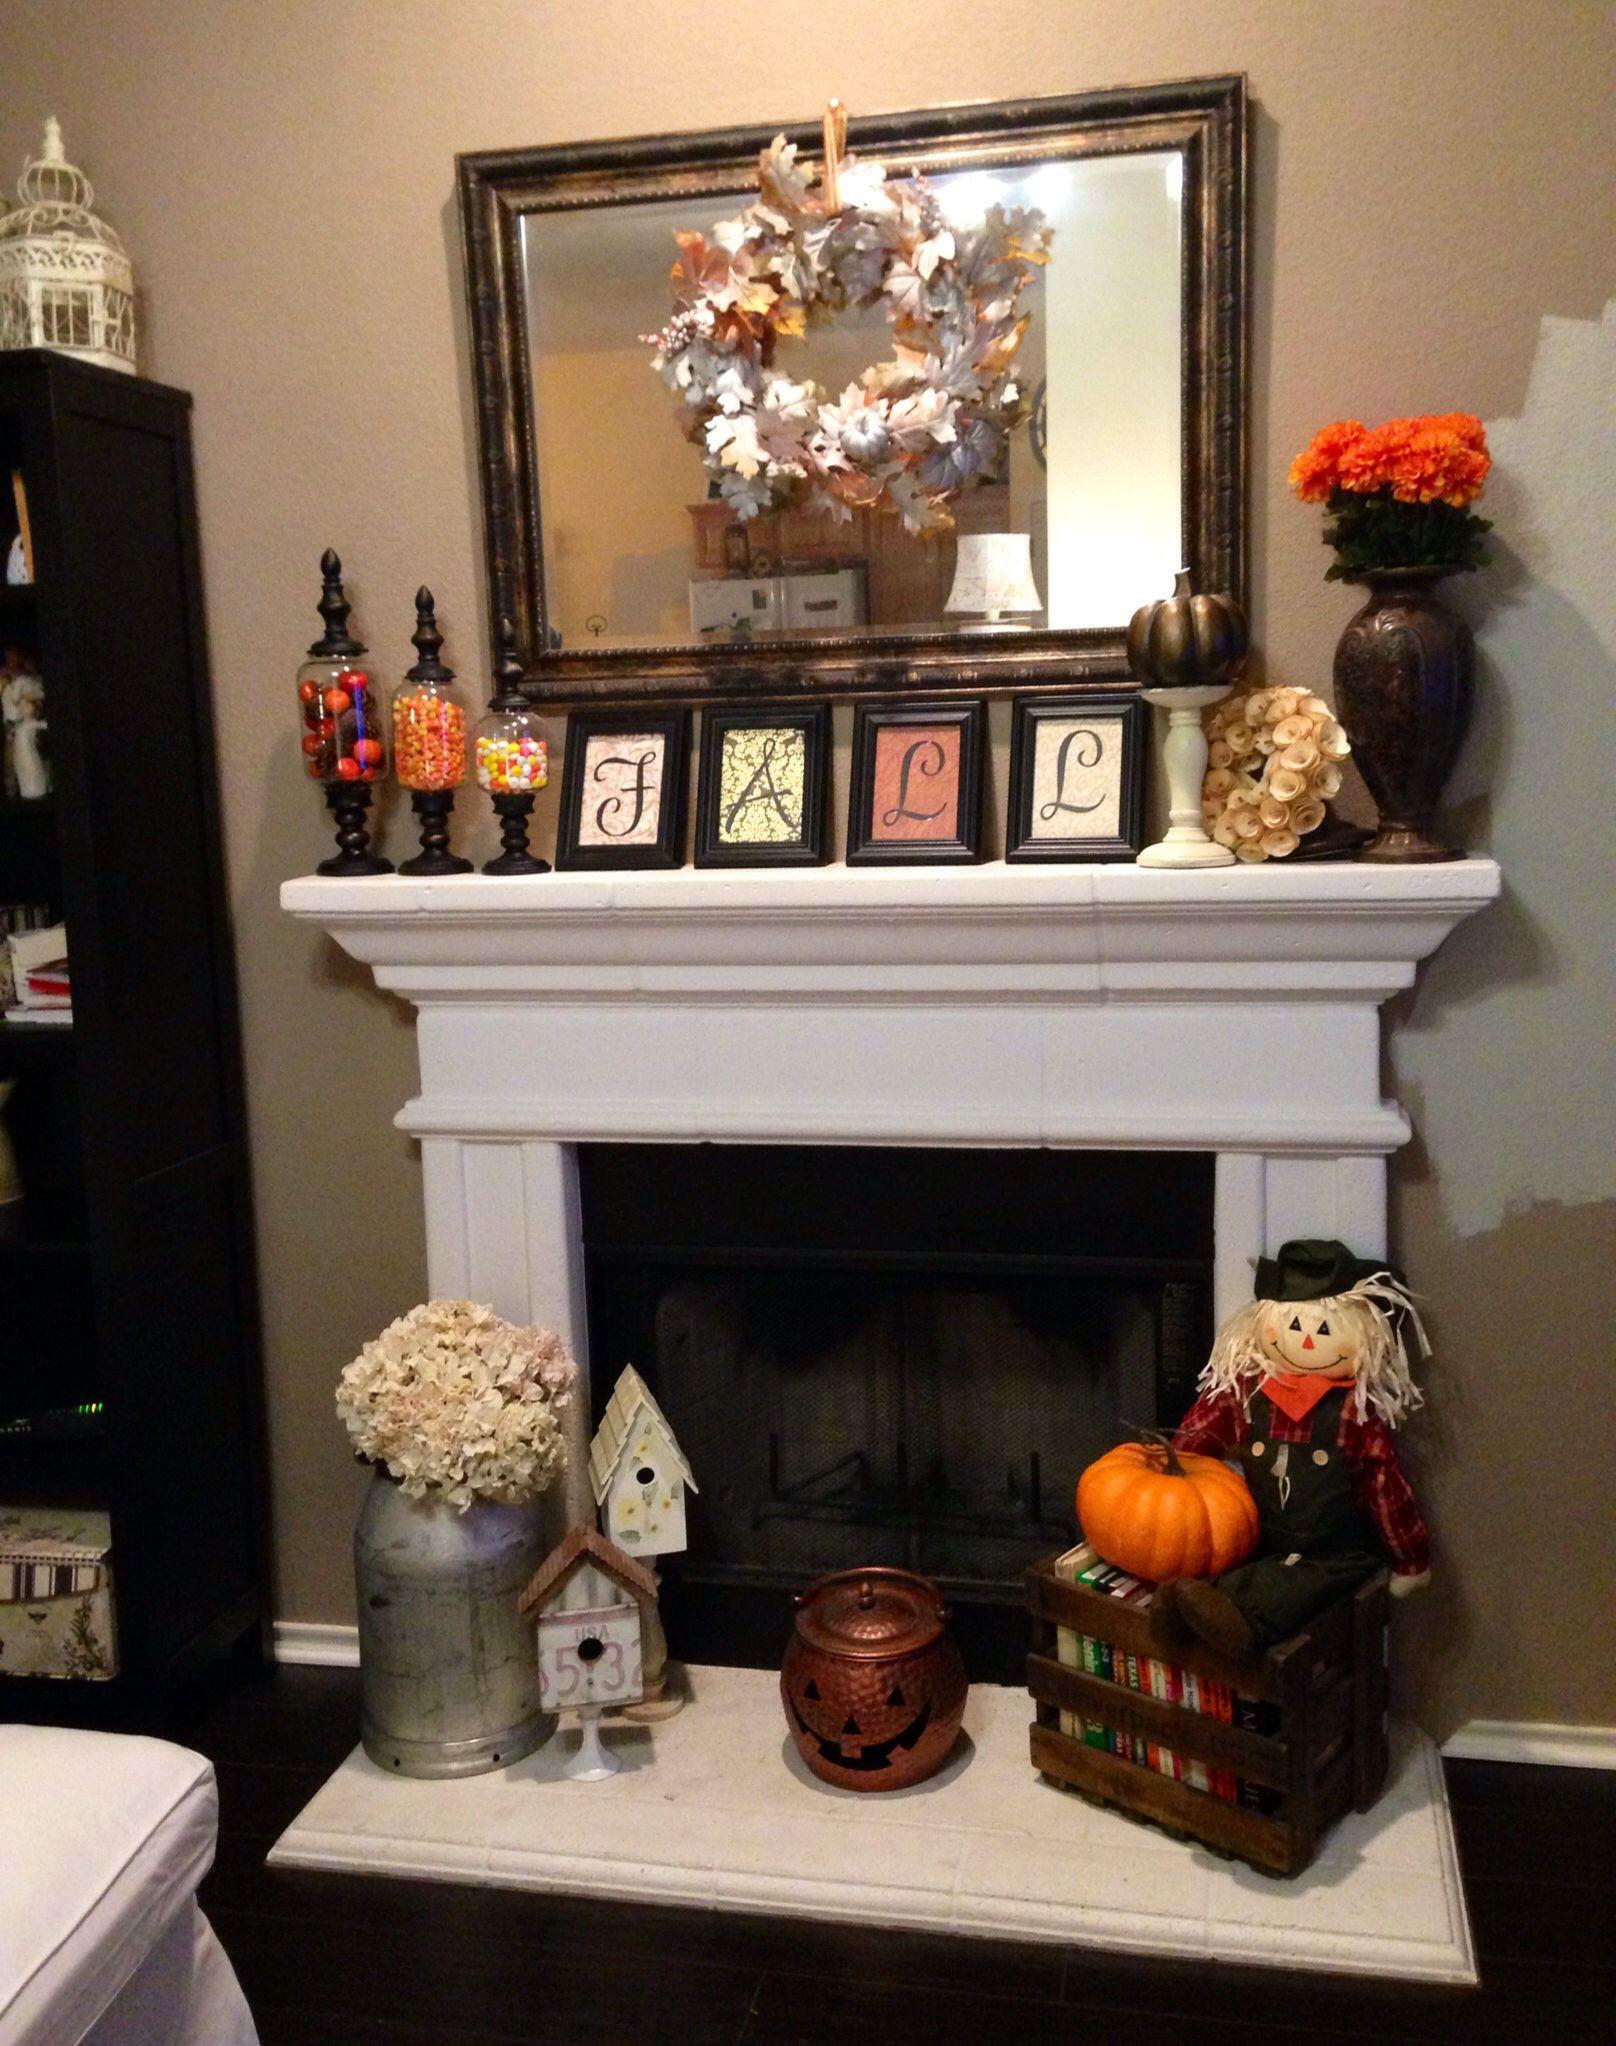 Fall Decor For Fireplace  Fireplace Fall decor Fall into Autumn